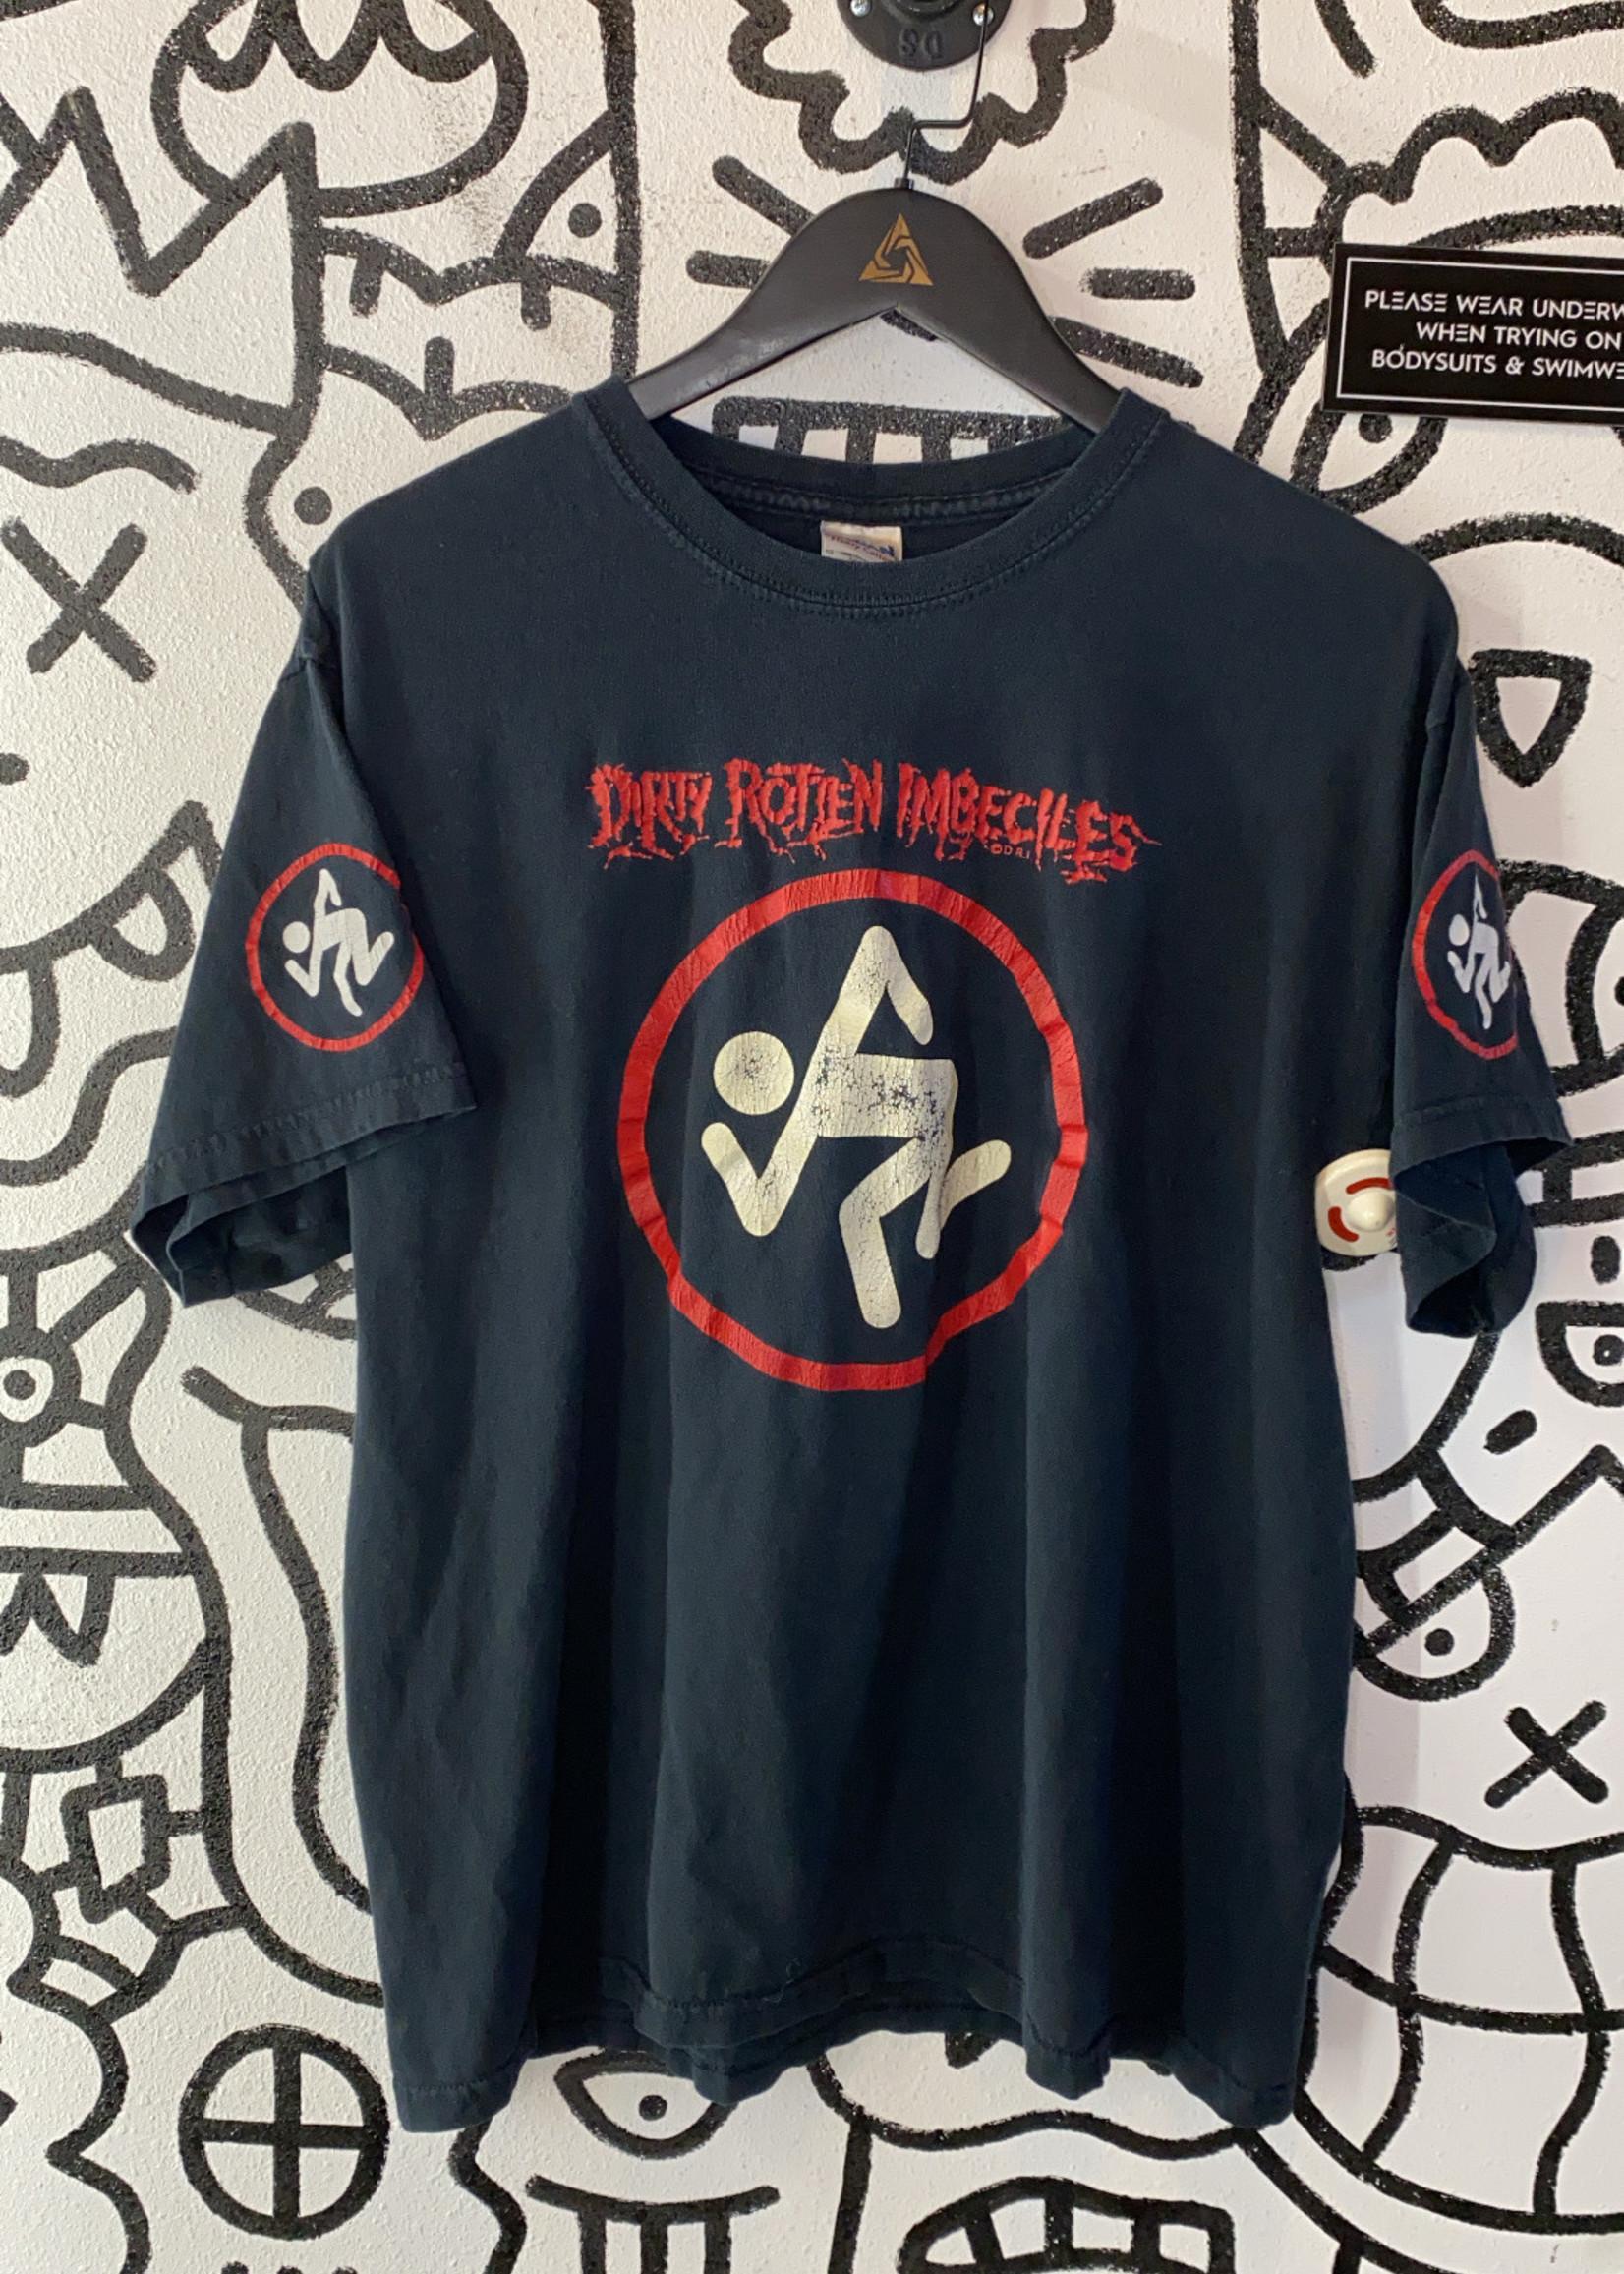 Vintage Dirty Rotten Imbeciles Black Shirt L